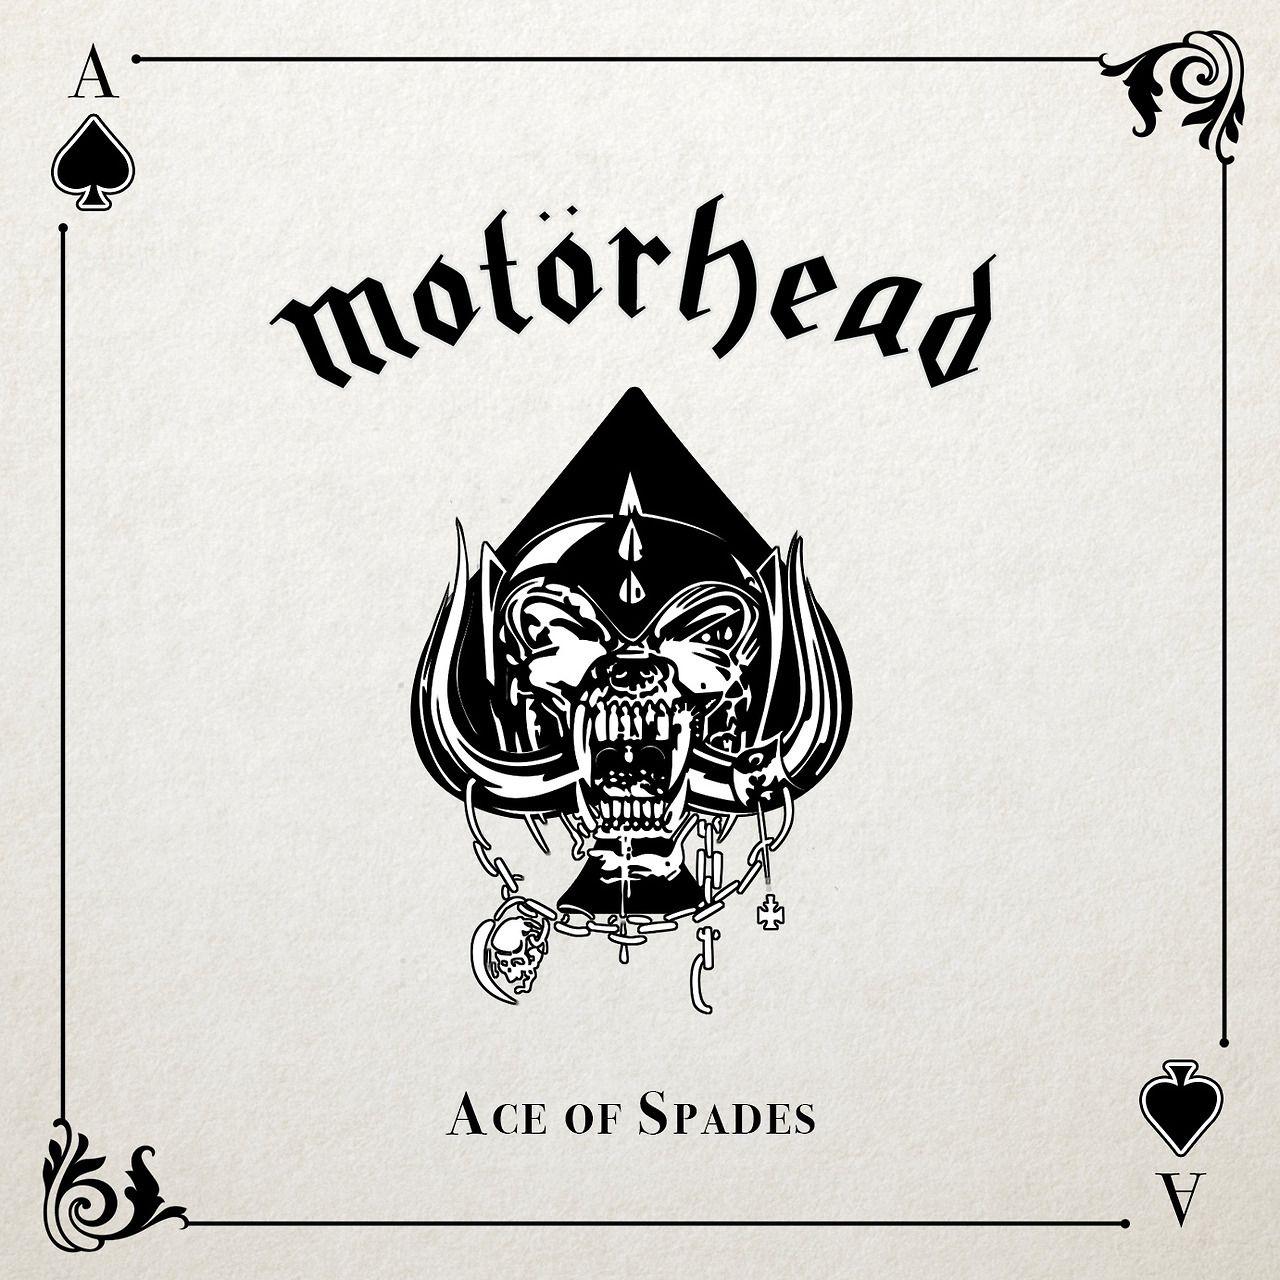 3 meses de Tidal o Deezer gratis gracias a Mötorhead y Music.com